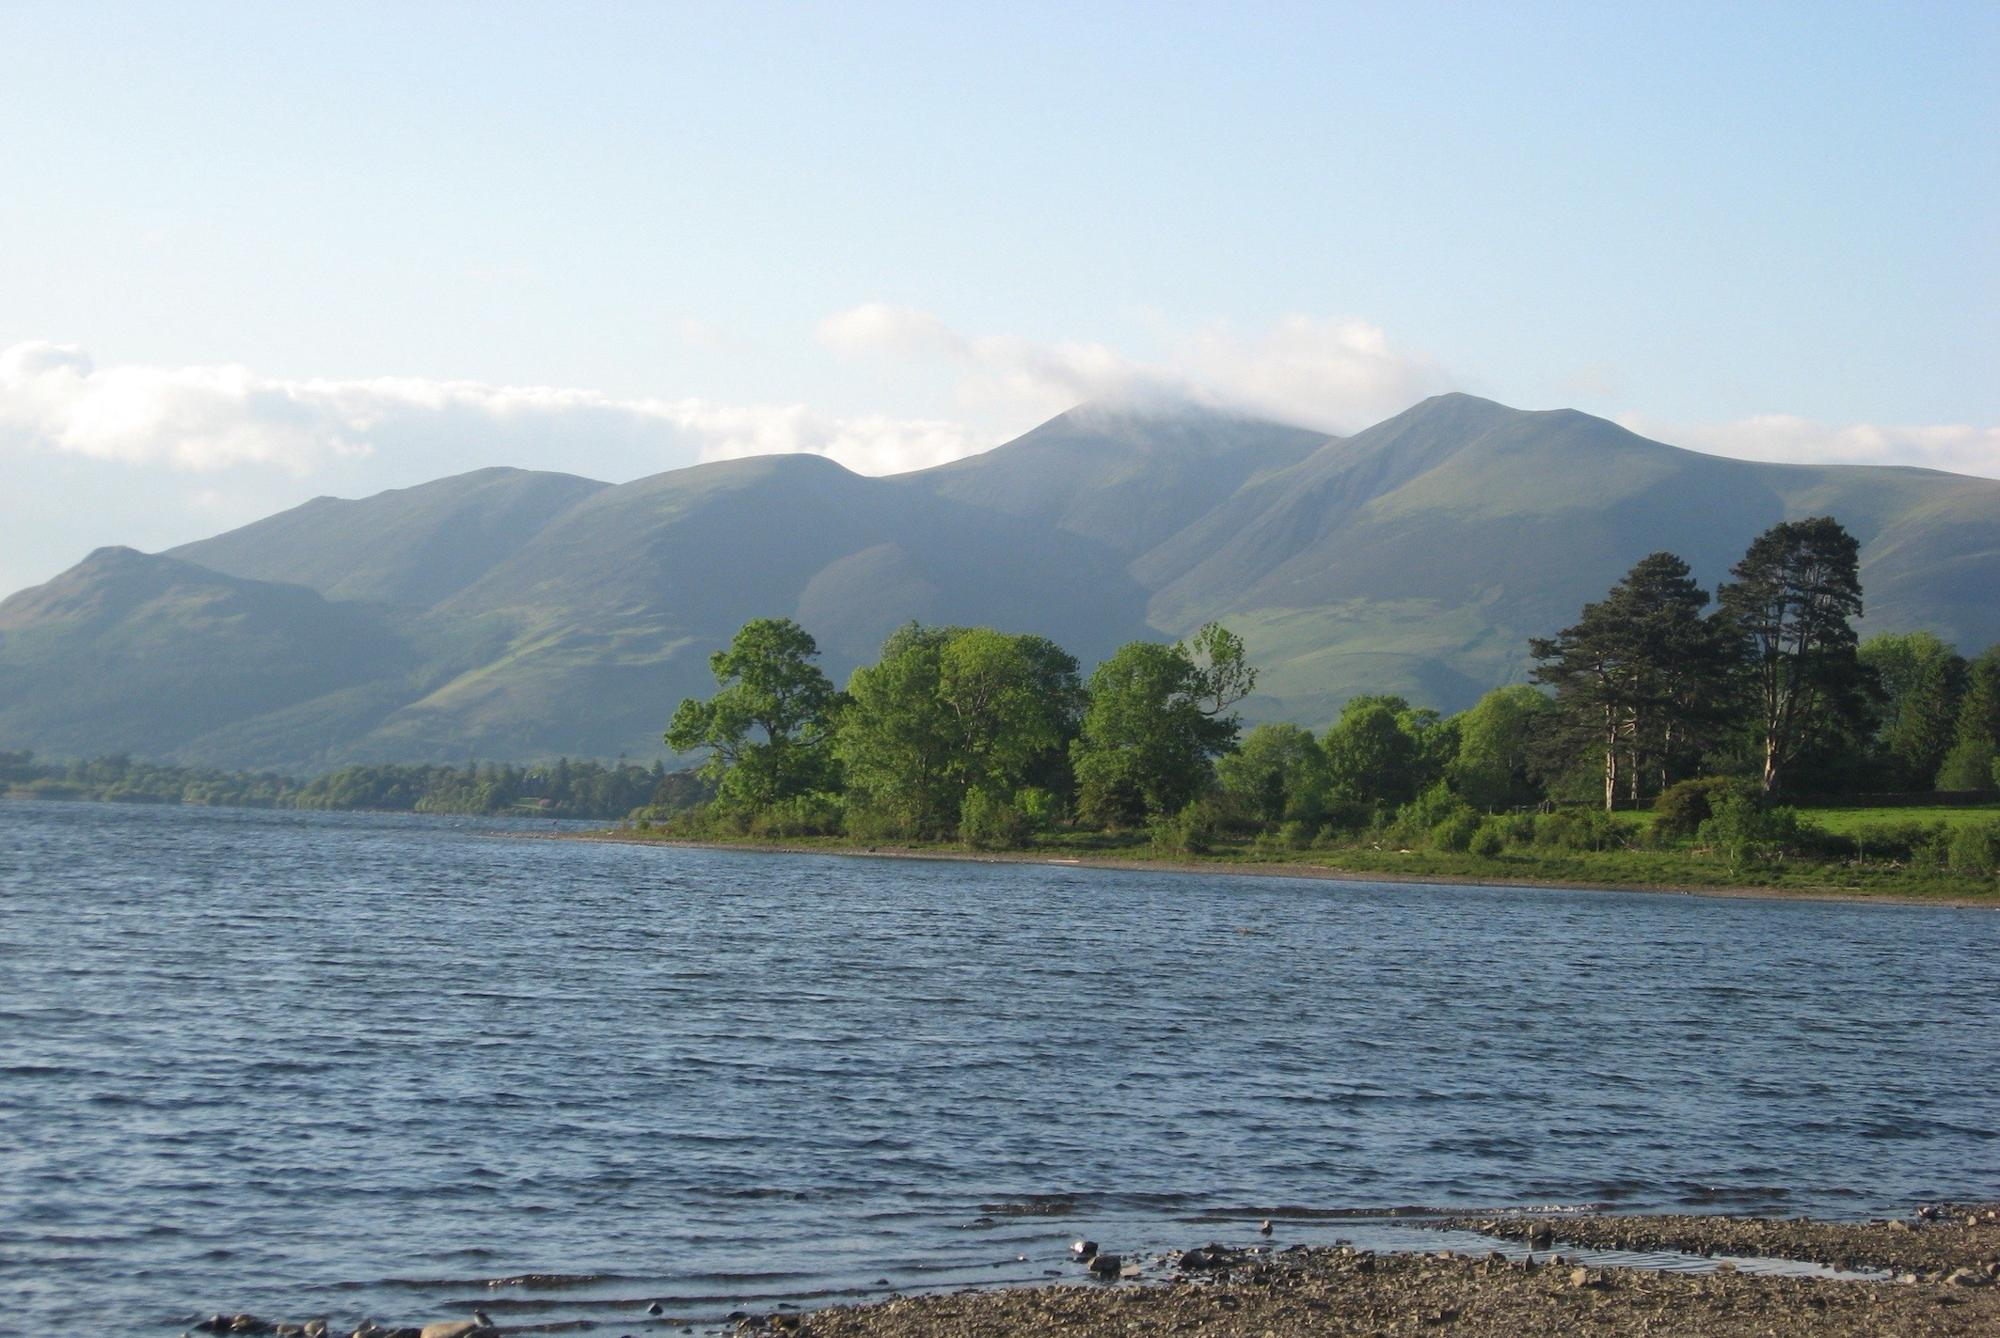 Keswick Camping – Campsites near Keswick, Lake District